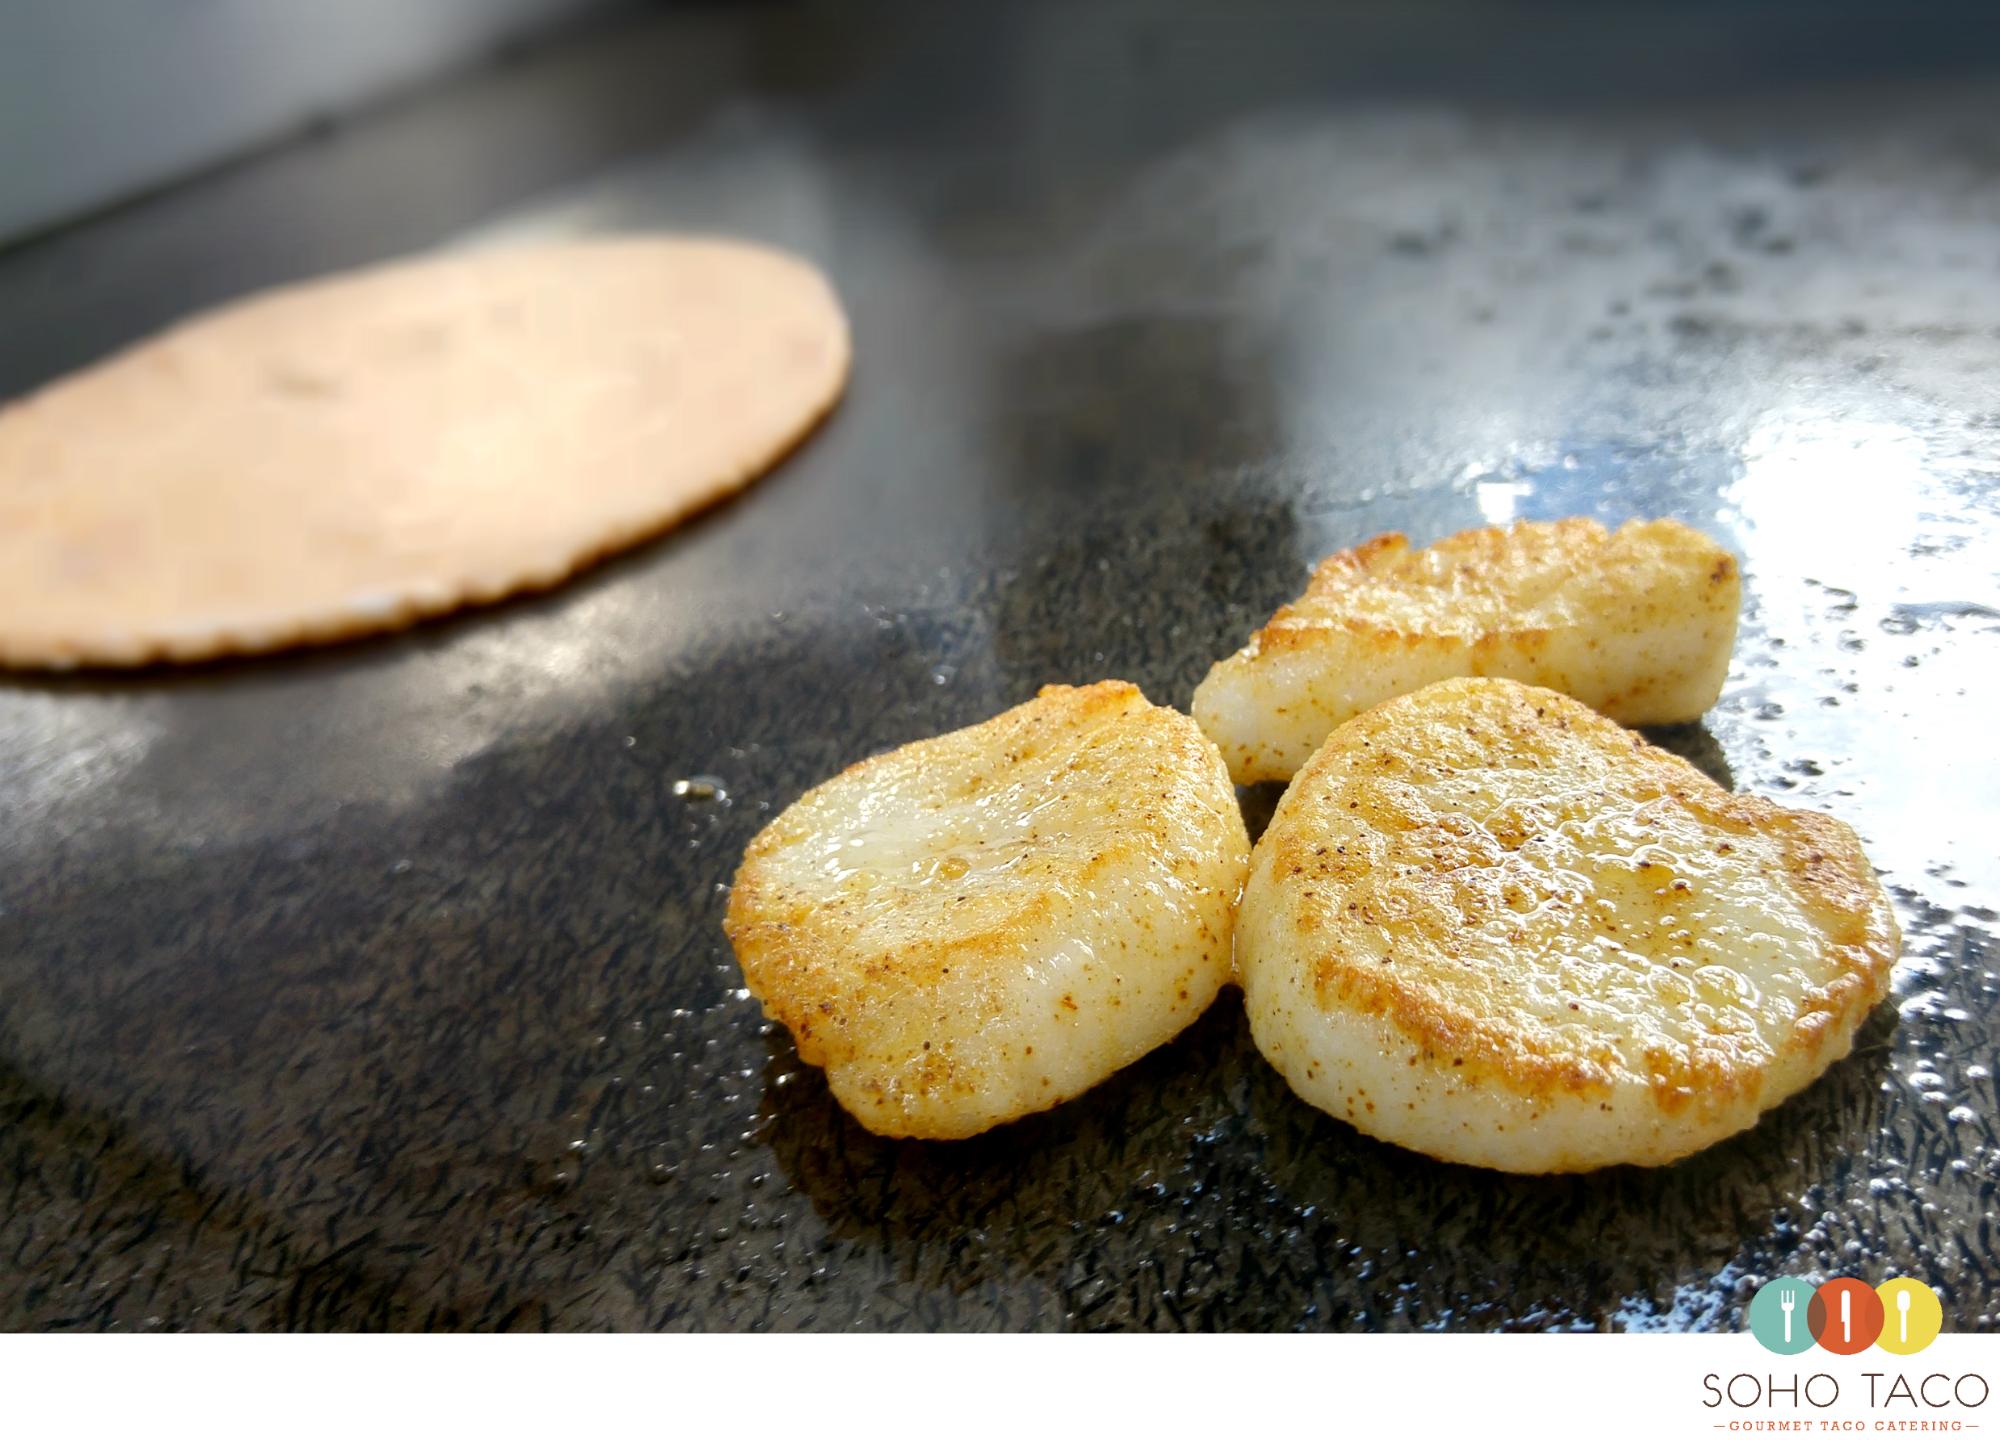 SOHO TACO Gourmet Taco Catering - Los Angeles - LA County - Scallops - Tomato Tortilla